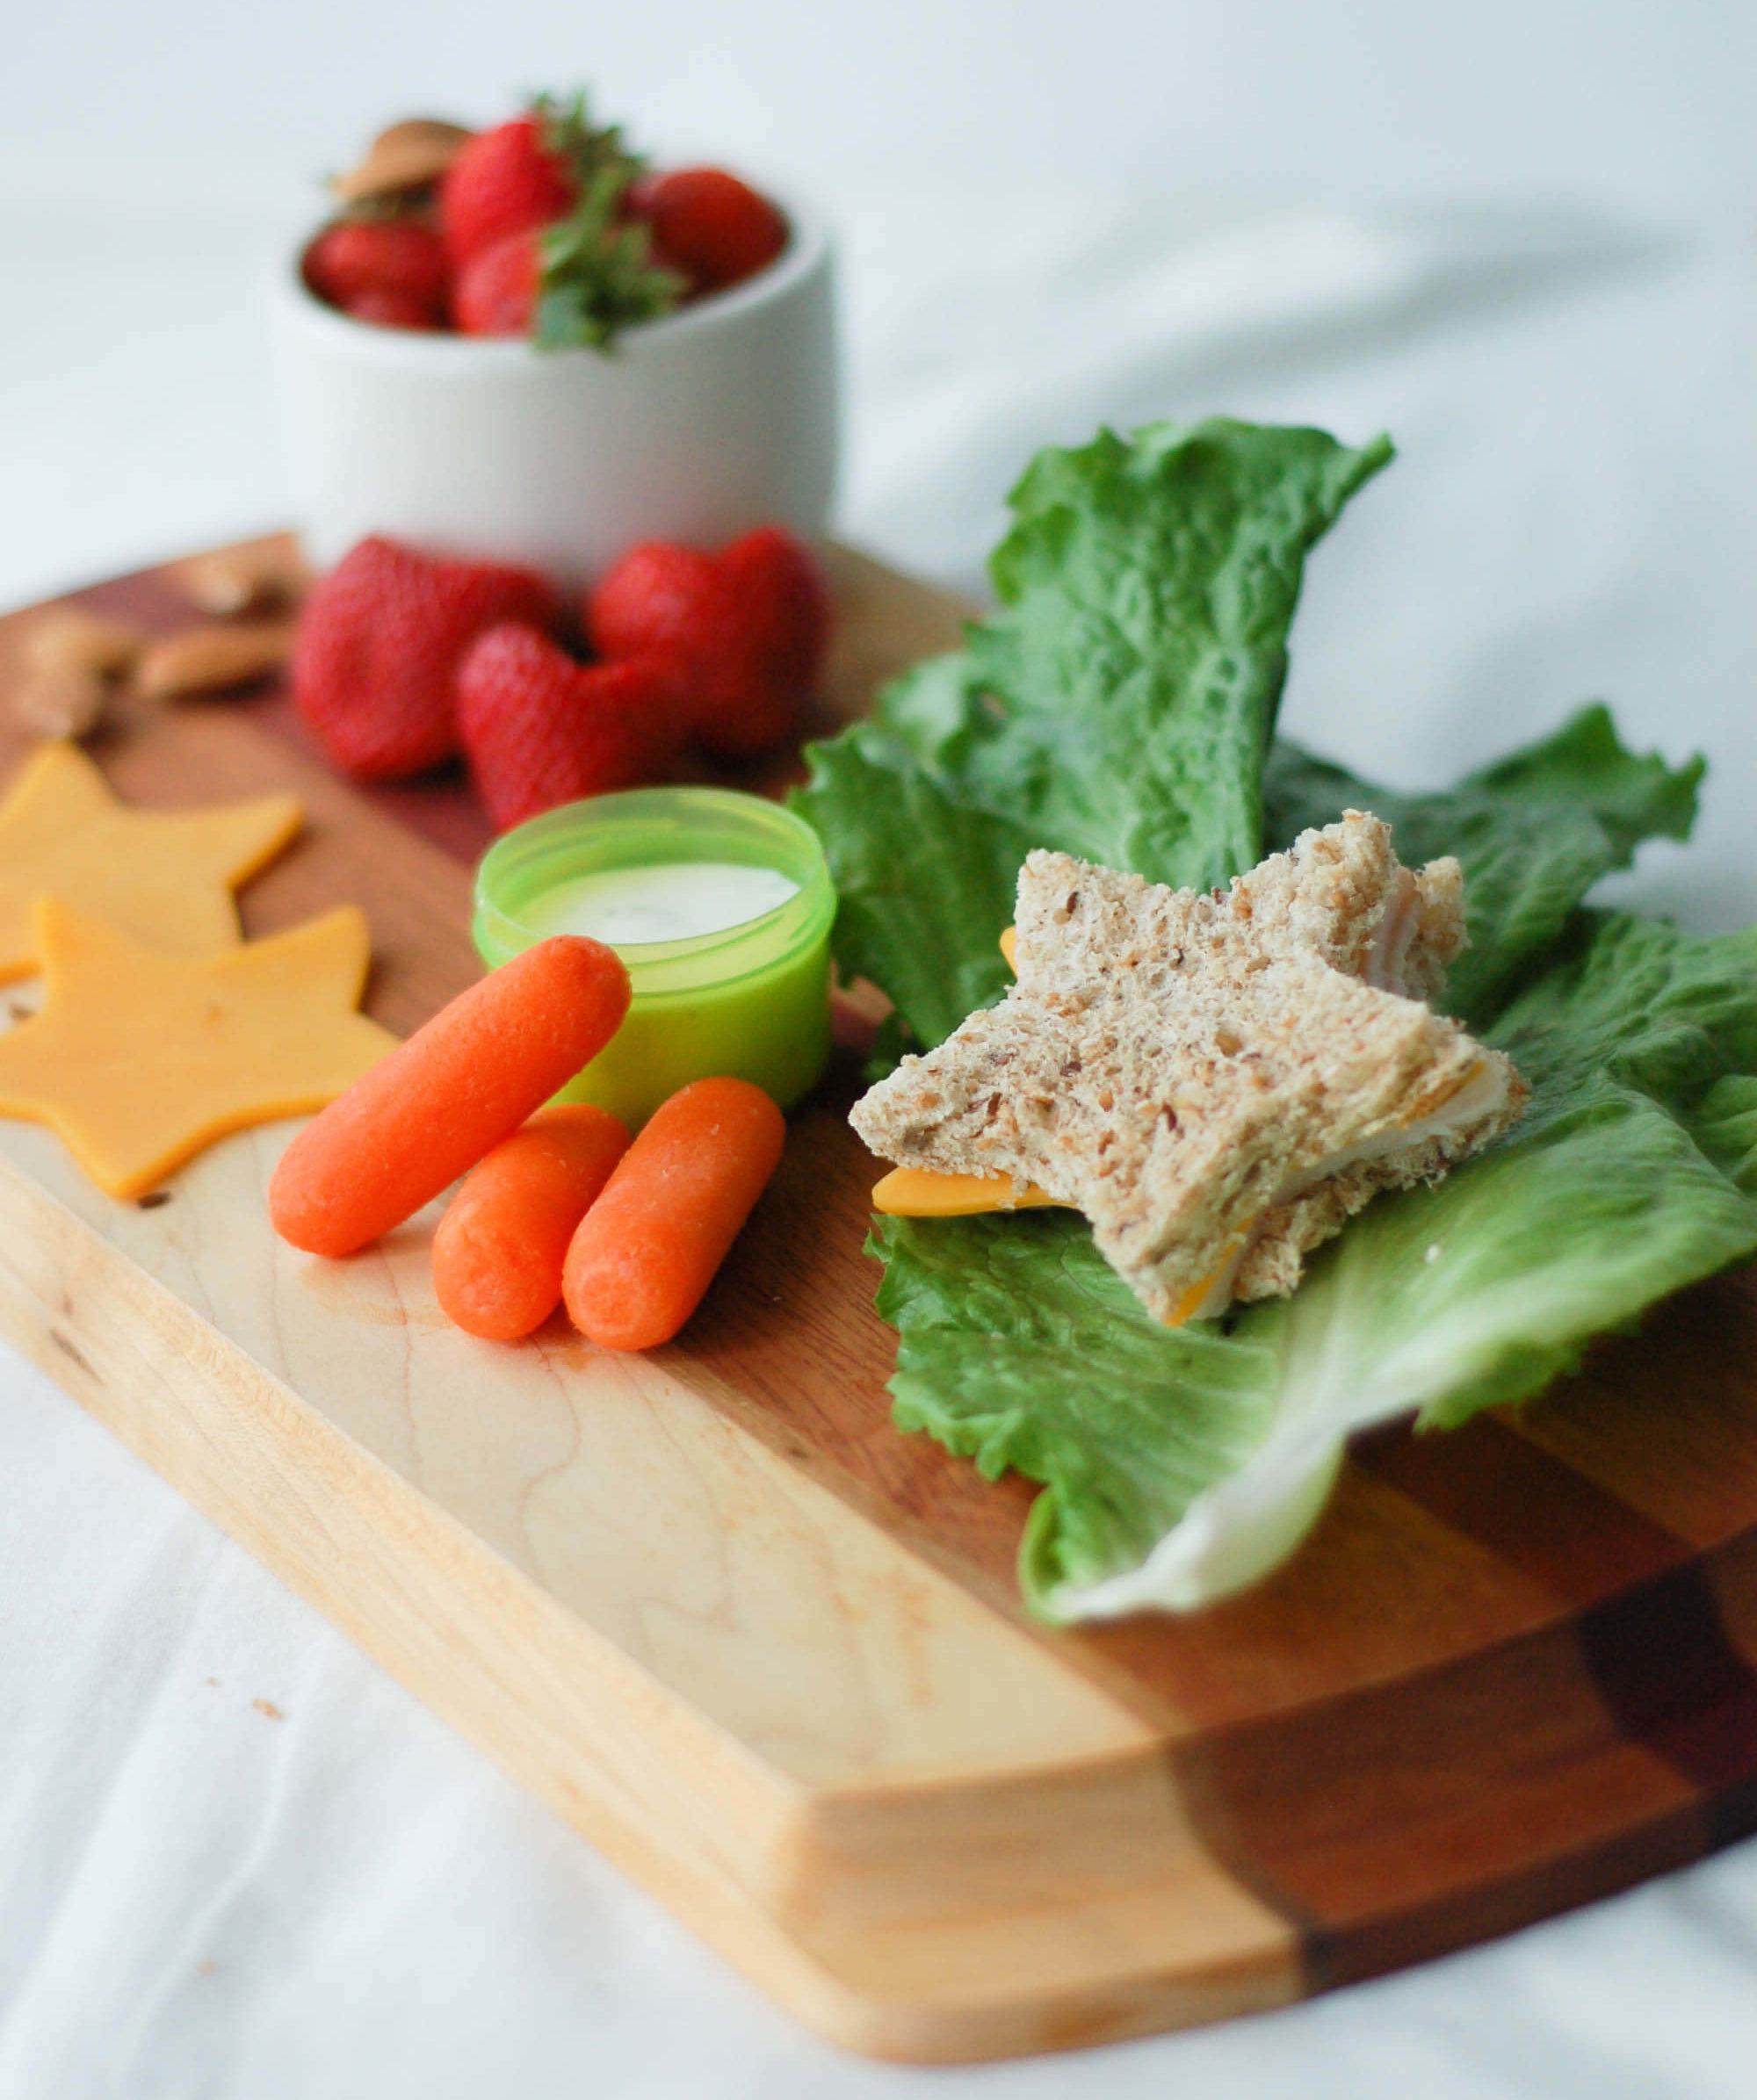 Healthy lunch ideas for packing school lunch box via createkidsclub.com